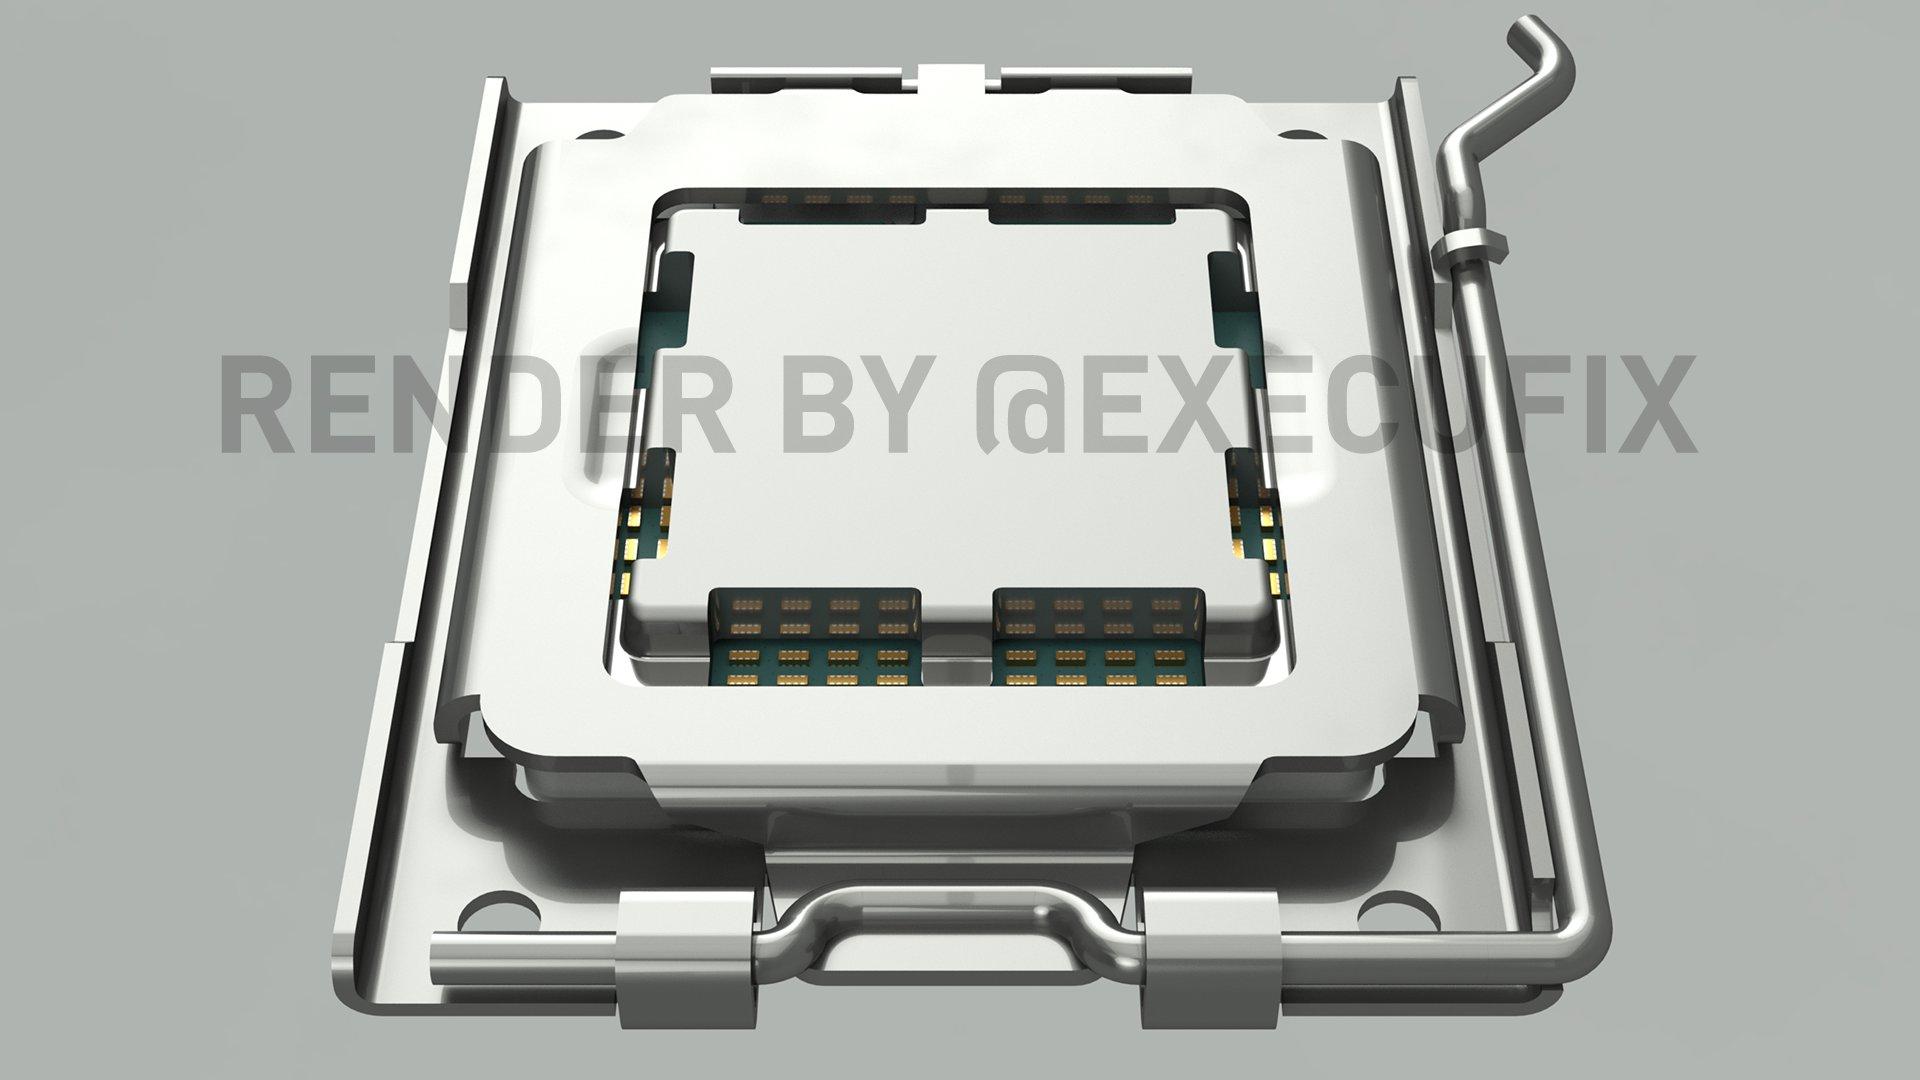 AMD AM5 LGA 1718 CPU Socket For Next-Gen Ryzen Desktop CPUs Pictured In Latest Renders